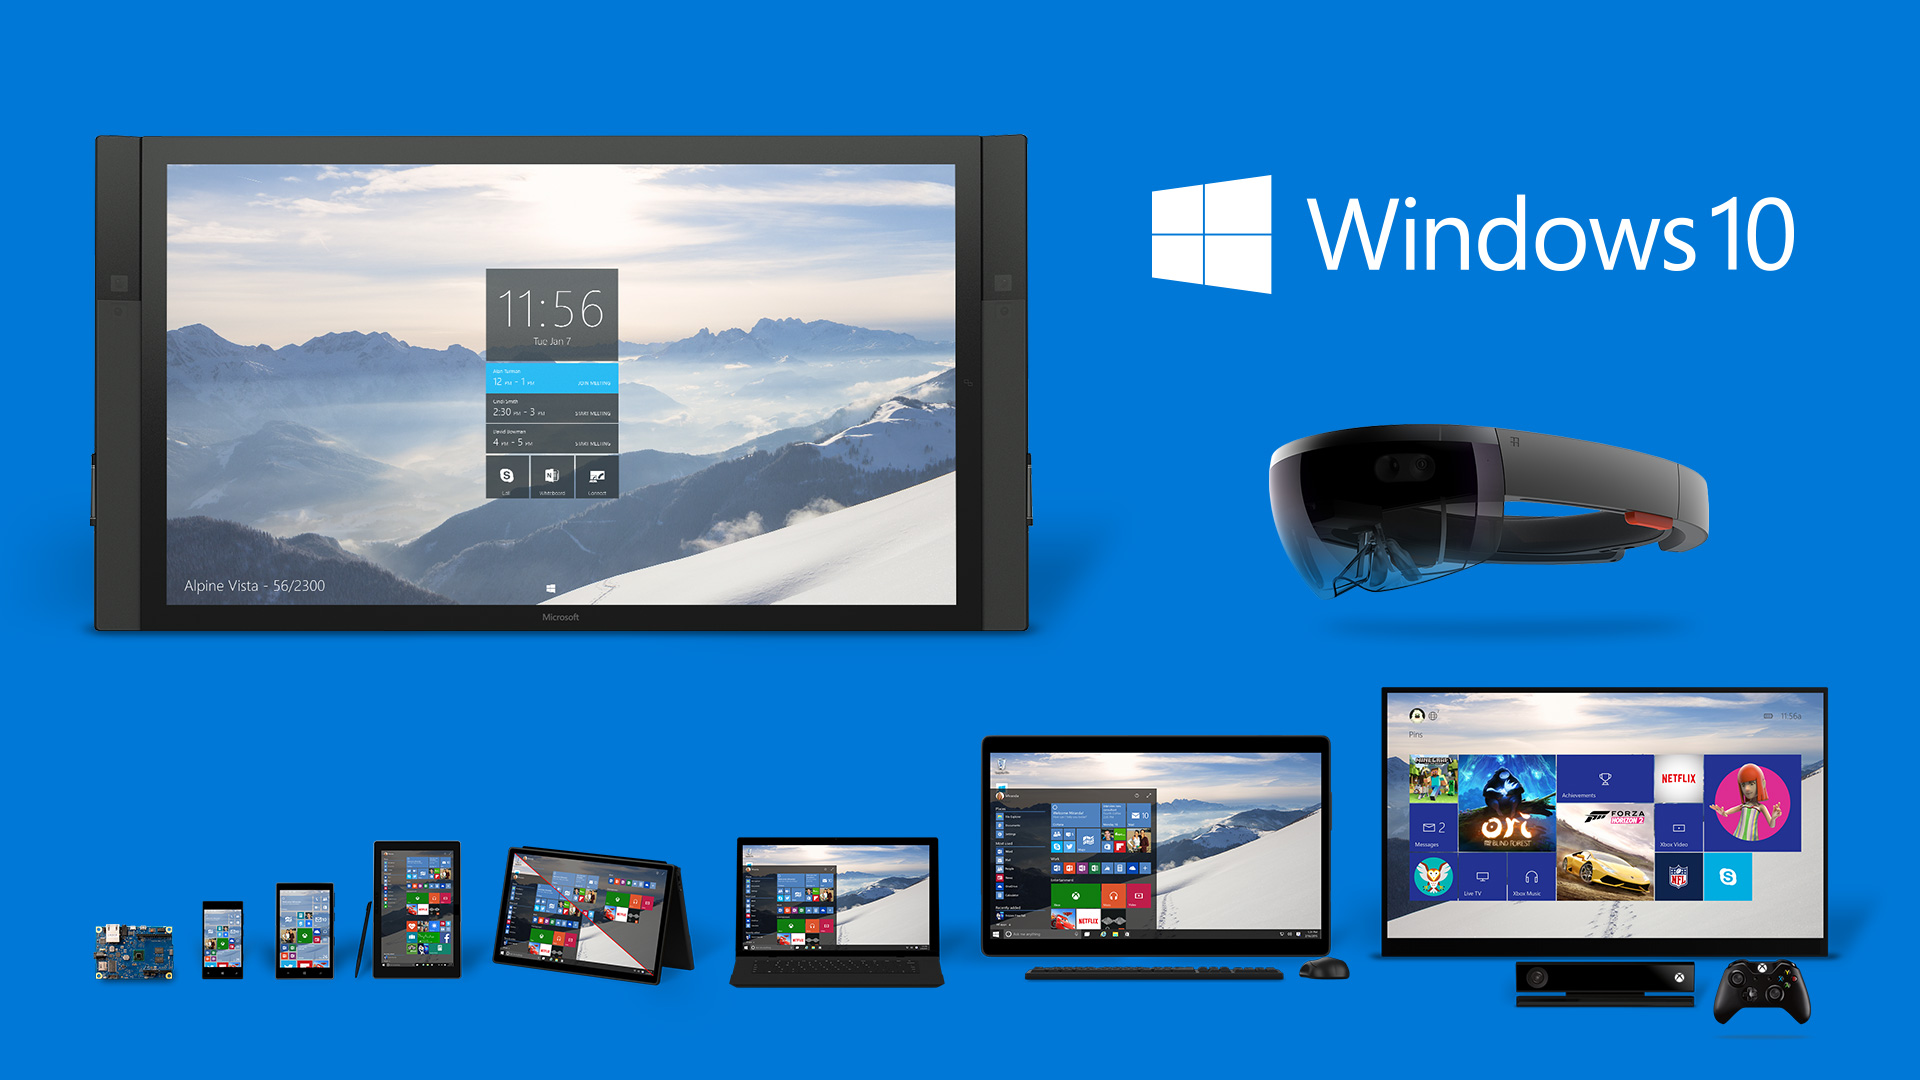 Windows10登場!Windows7、Windows8.1ユーザー期間限定で無償アップグレード 7月29日開始